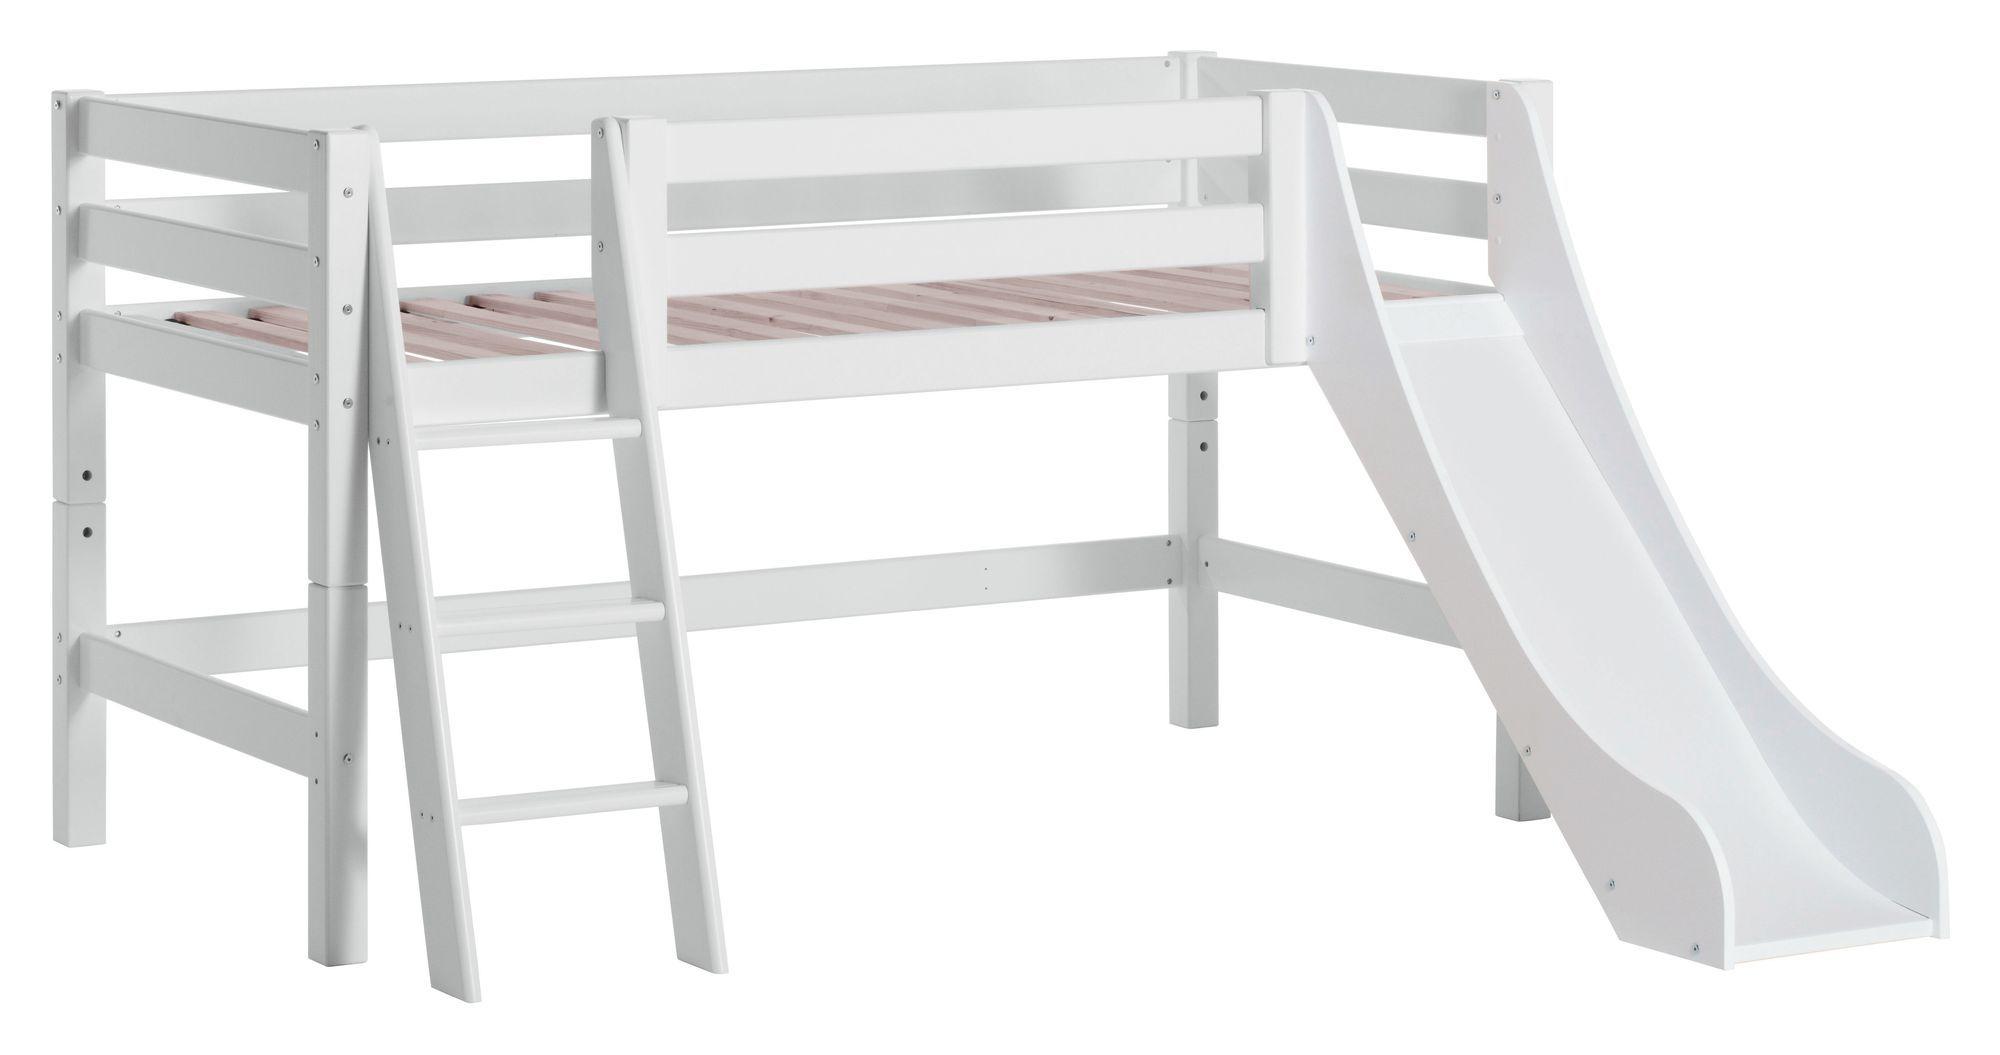 Hoppekids PREMIUM Halvhøj seng m. rutsjebane, 90x200